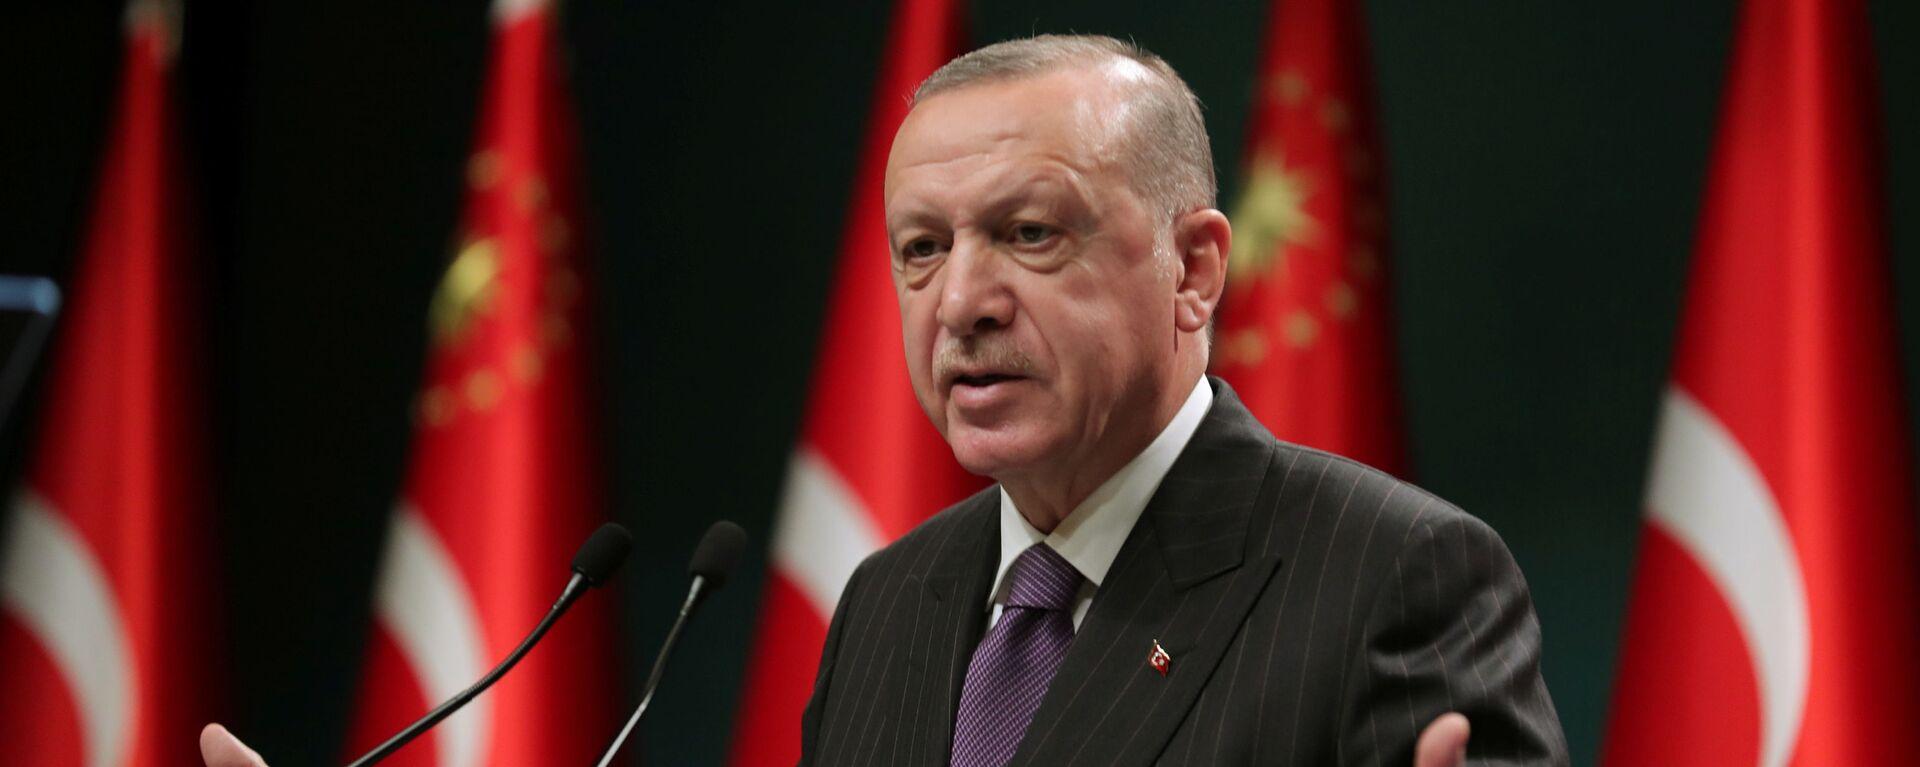 Prezydent Turcji Recep Tayyip Erdogan - Sputnik Polska, 1920, 12.01.2021